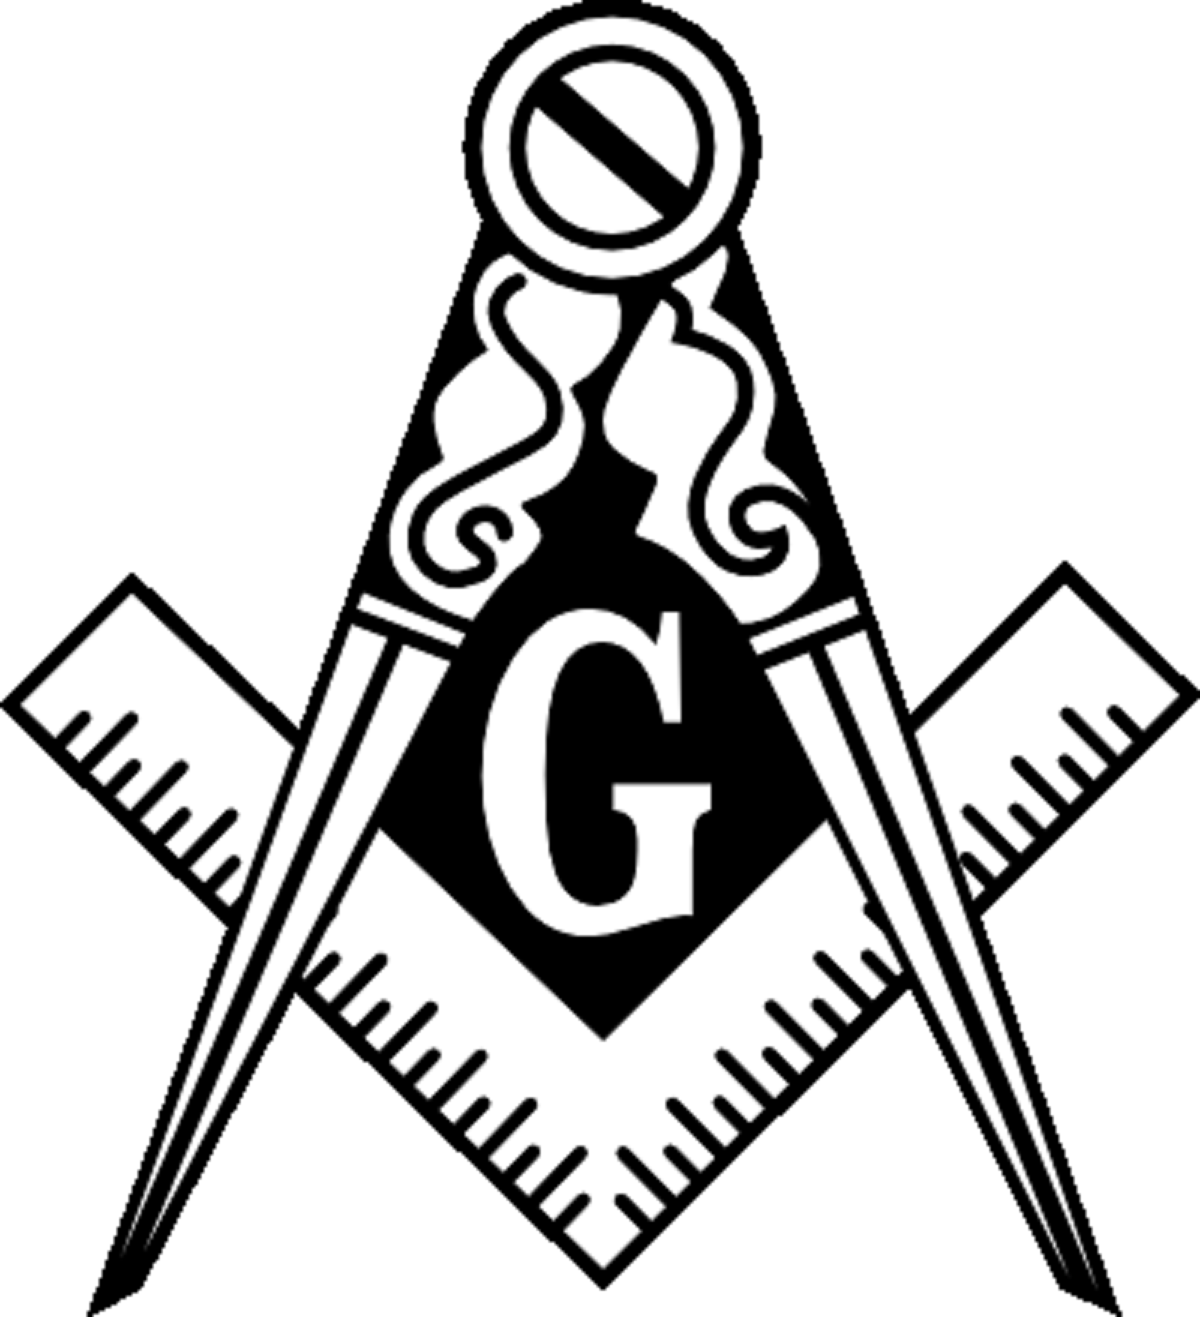 Masonic Square And Compass Logo Clipart.